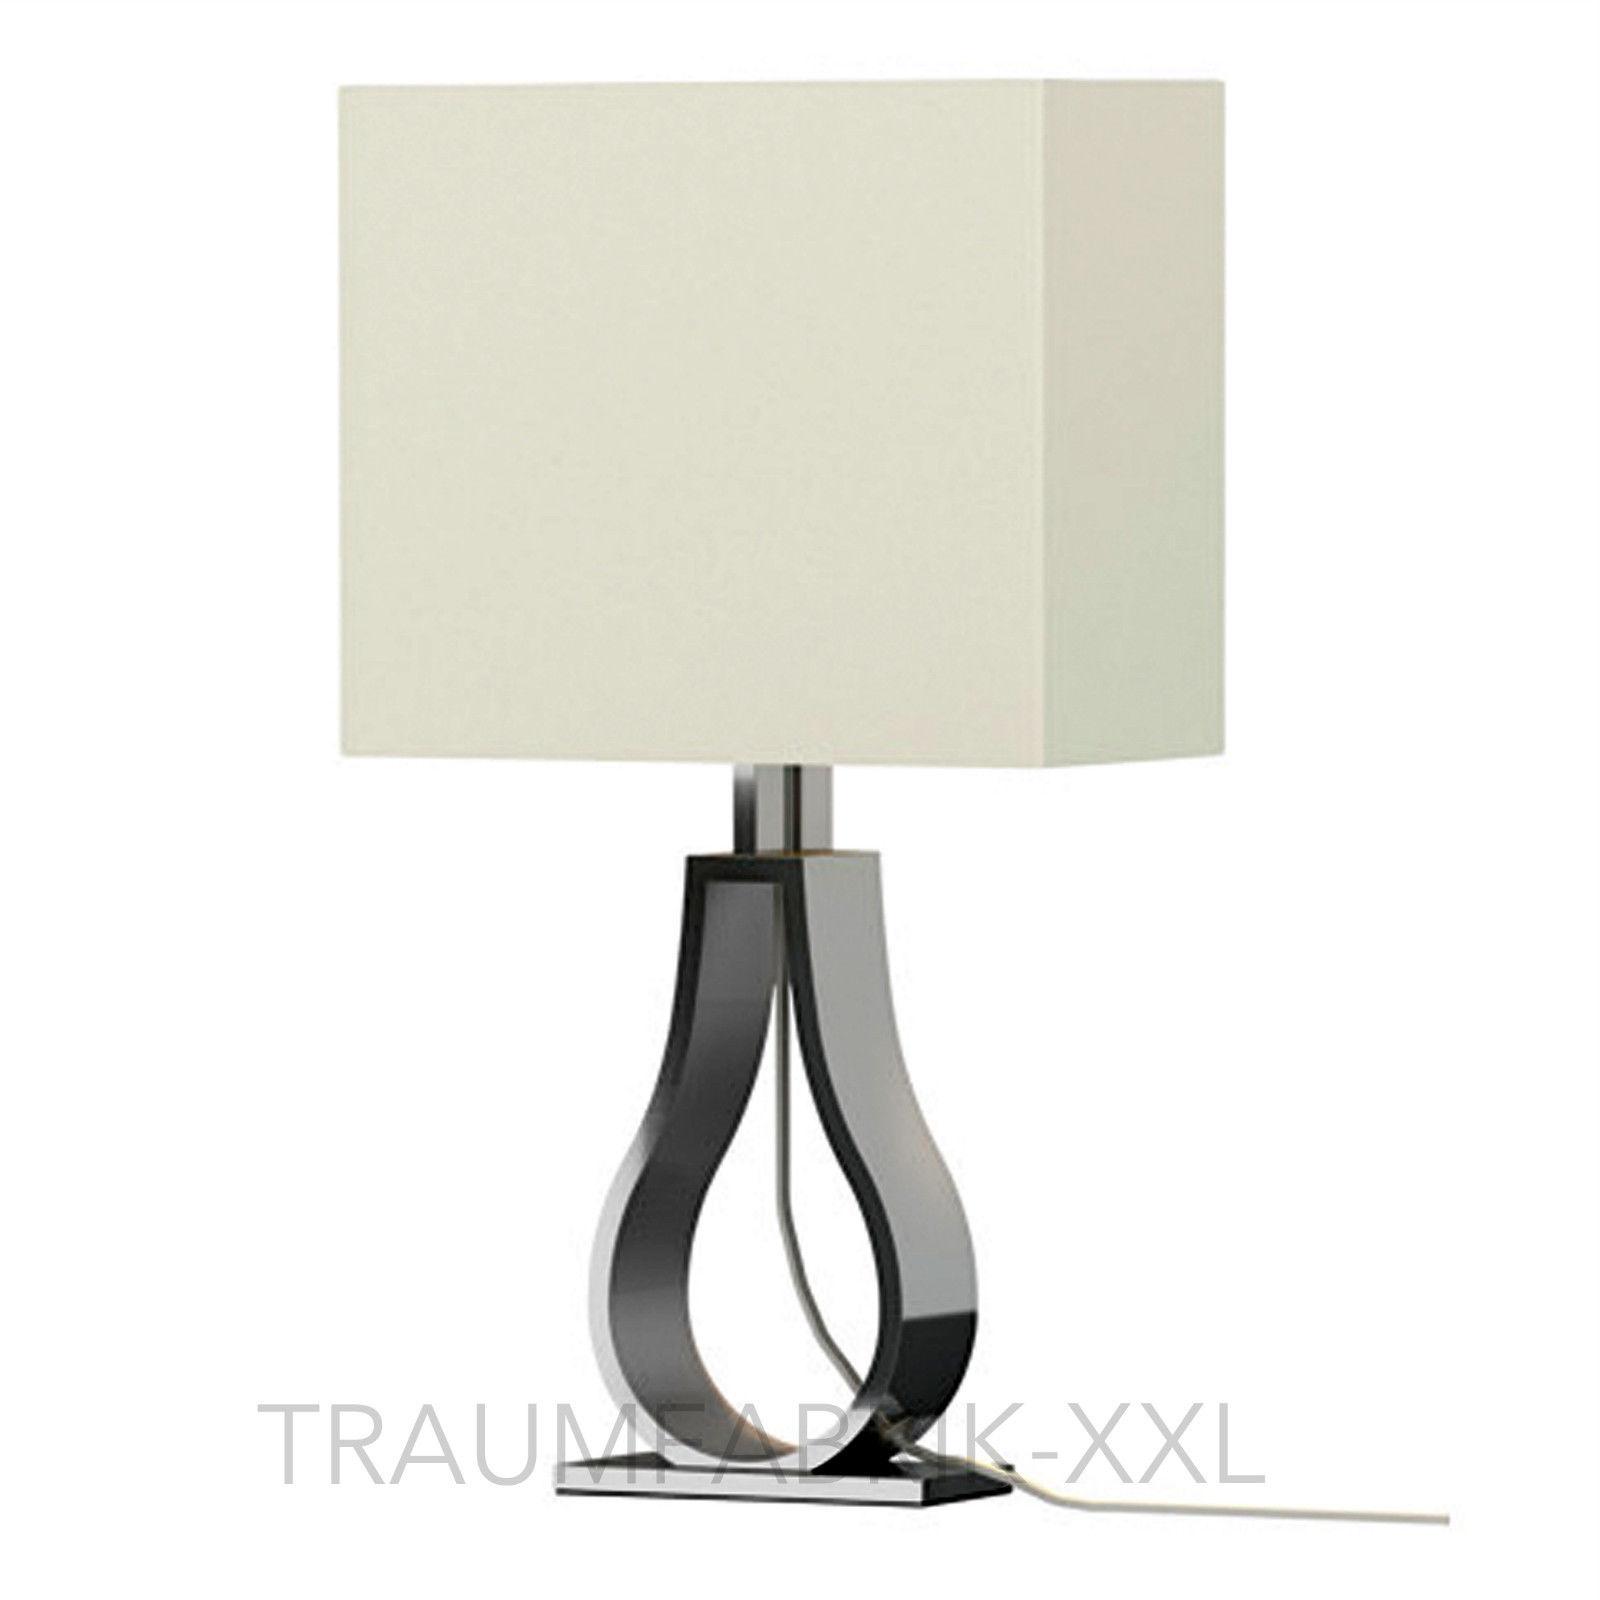 lampe rund cheap tnde sauna elovn m med terrasse with. Black Bedroom Furniture Sets. Home Design Ideas